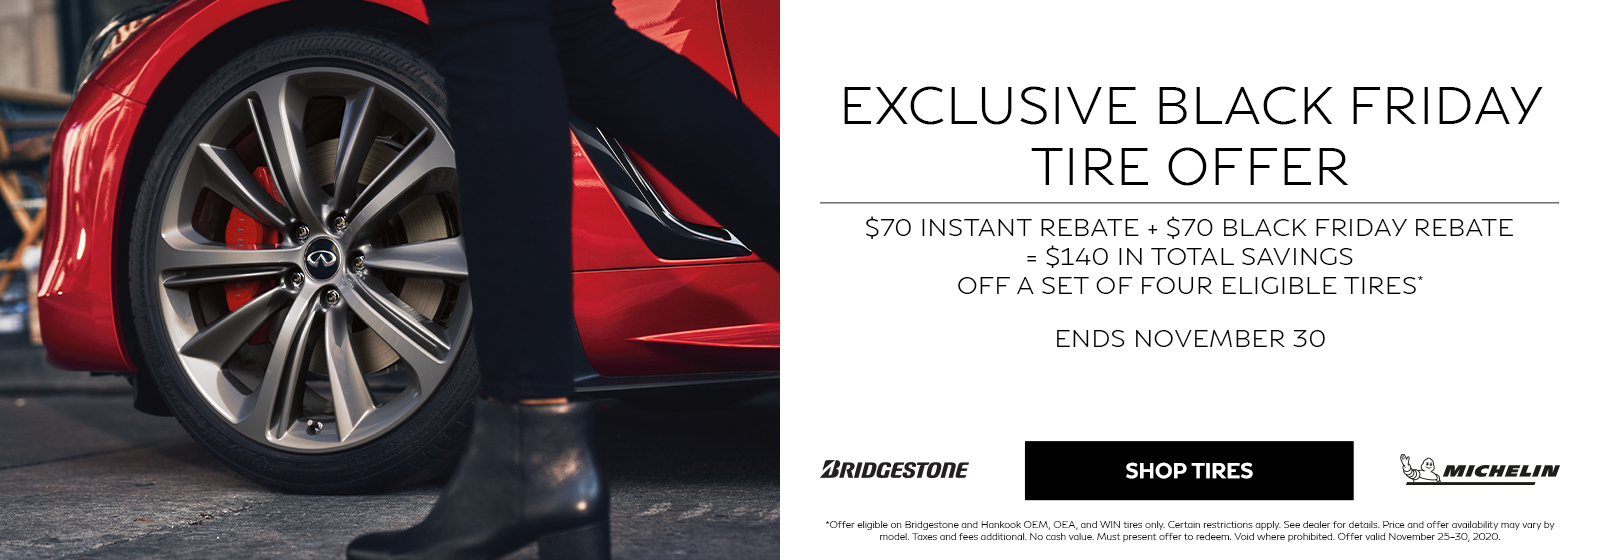 $70 Instant Rebate + $70 Black Friday Rebate = $140 in Total Savings Off a Set of Four Eligible Tires. Ends November 30, 2020.